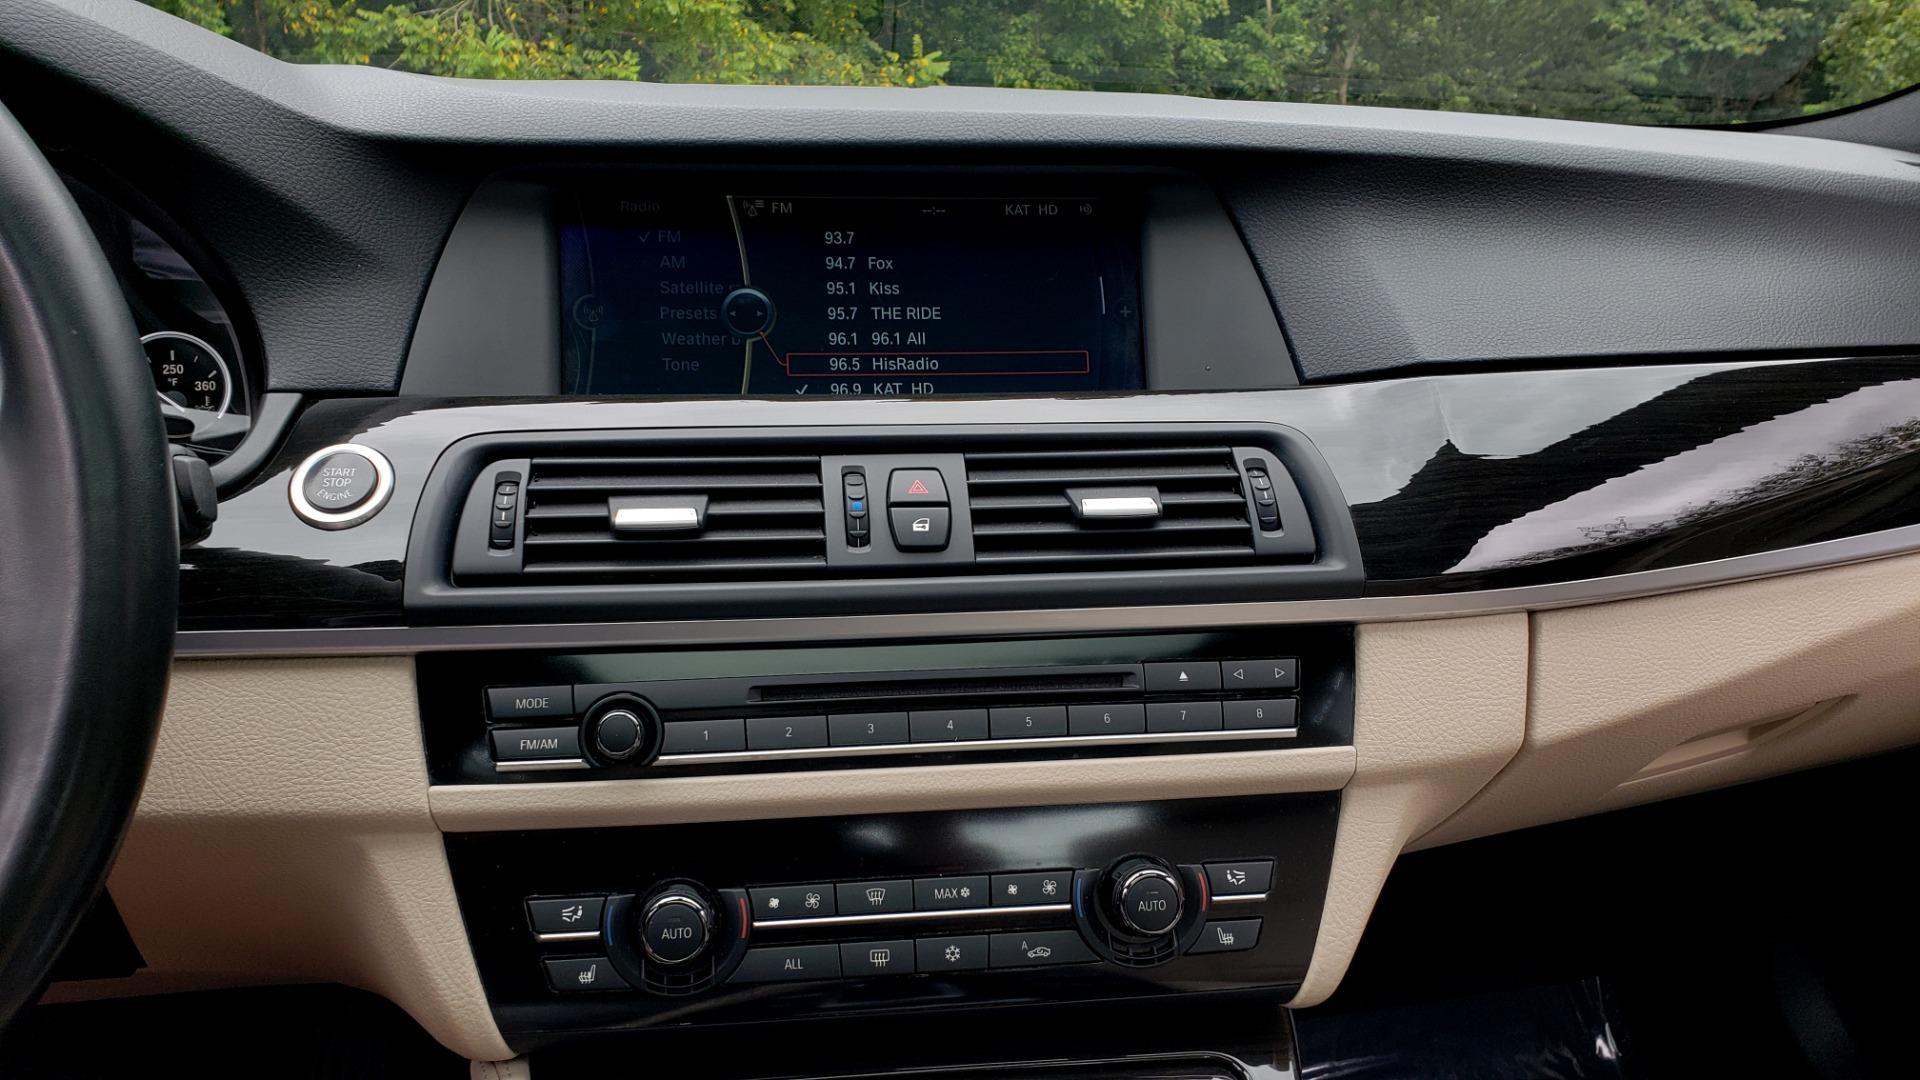 Used 2012 BMW 5 SERIES 550I M SPORT / NAV / CONV PKG / SUNROOF / PREM SND / REARVIEW for sale Sold at Formula Imports in Charlotte NC 28227 34